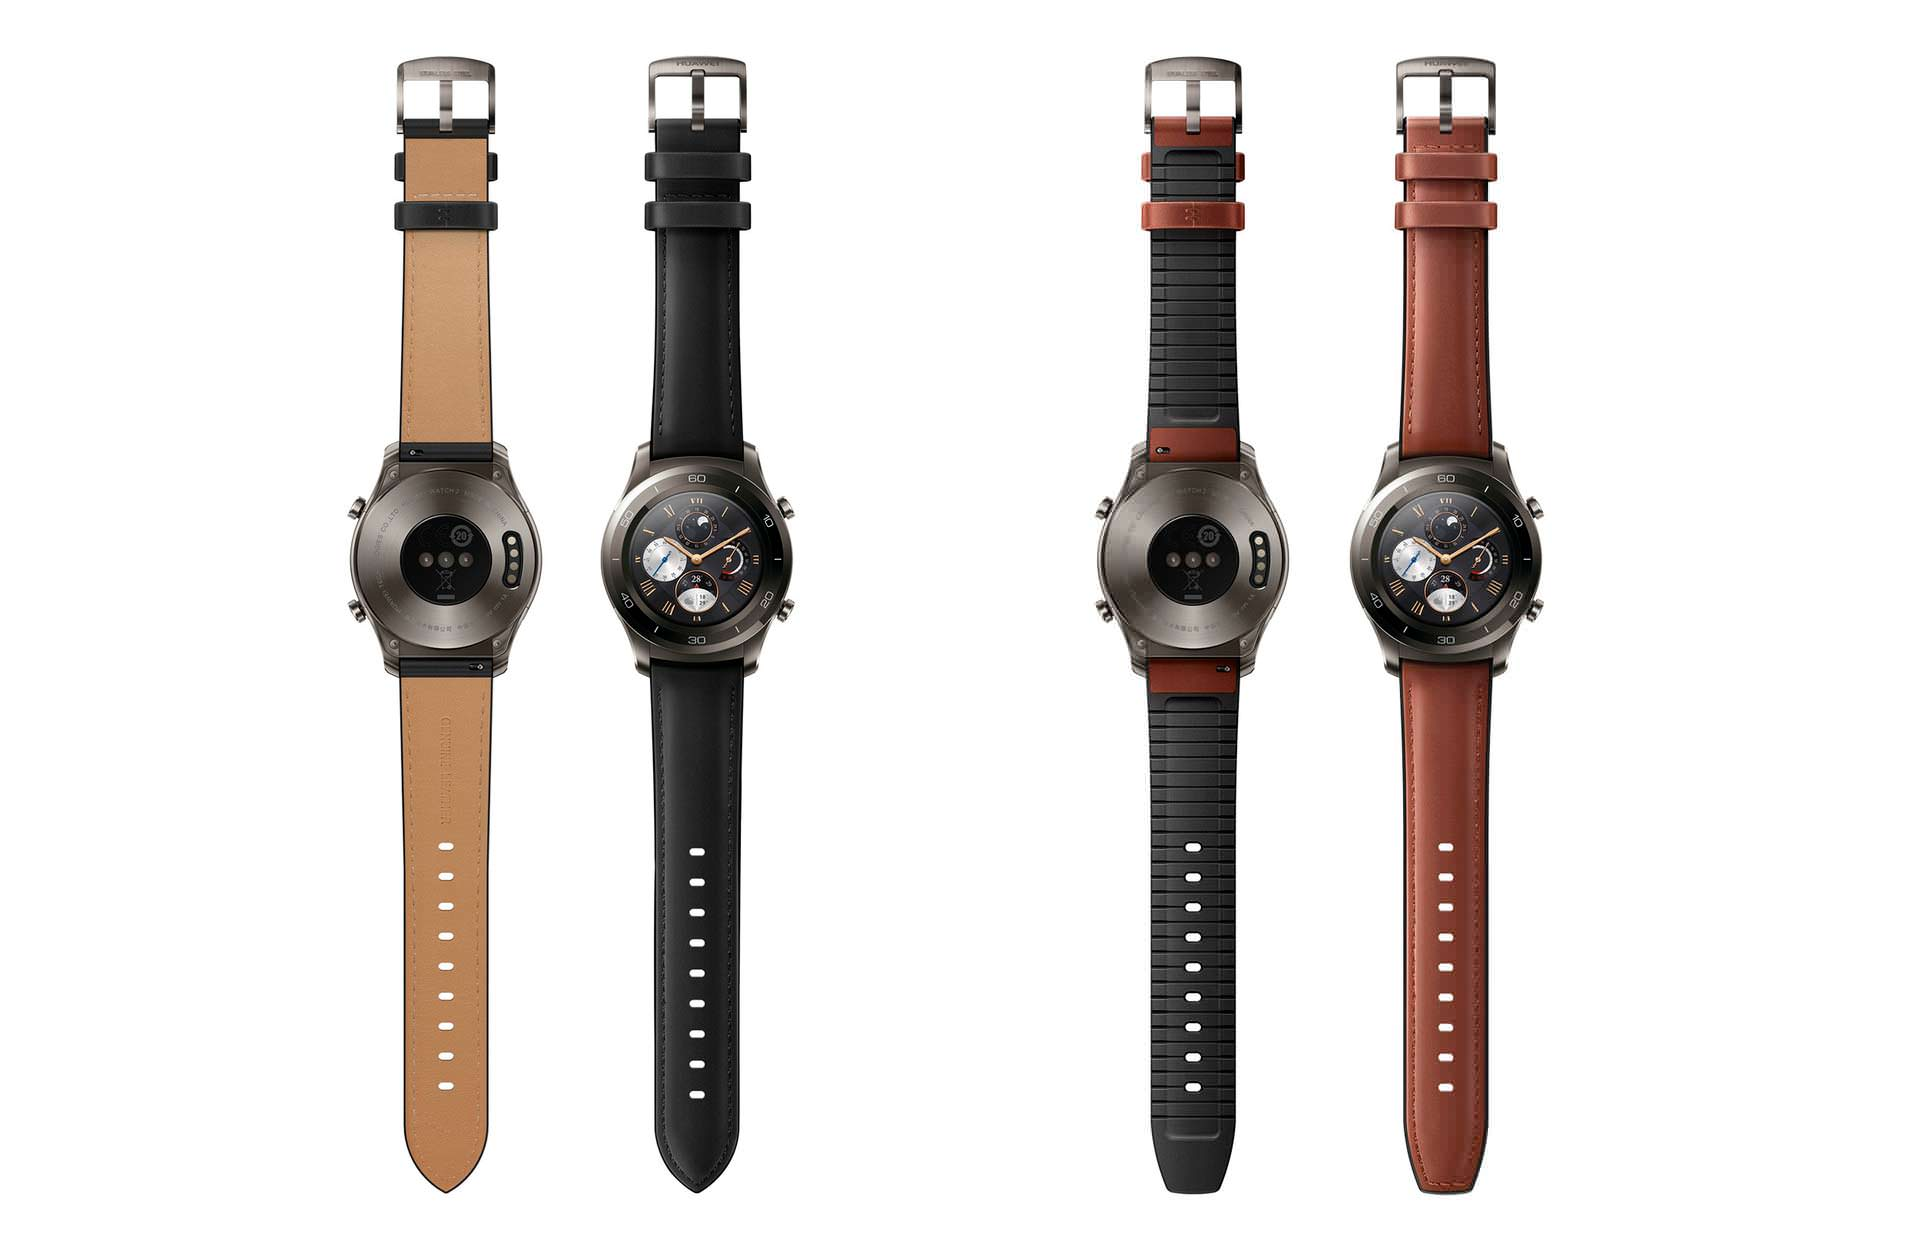 Цена Huawei Watch 2 329 евро